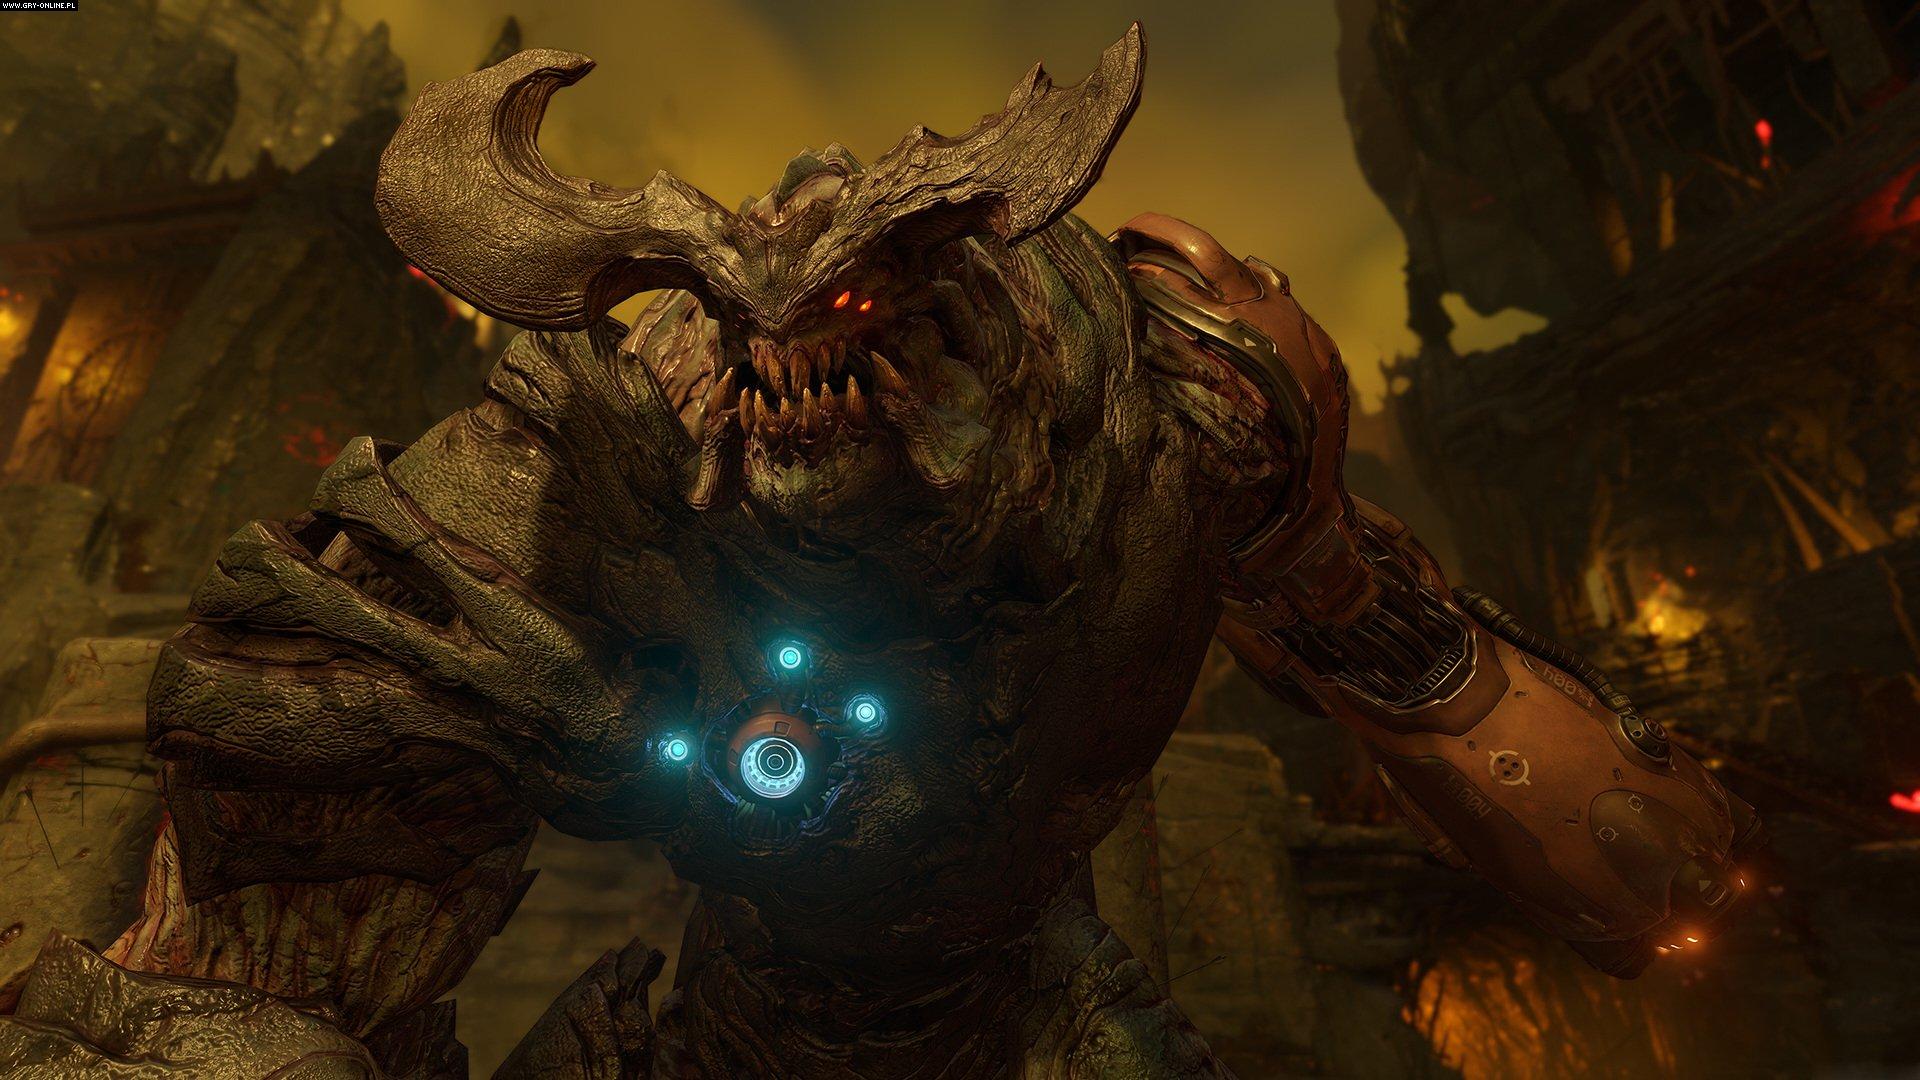 Doom PC, PS4, XONE Games Image 8/39, id Software, Bethesda Softworks